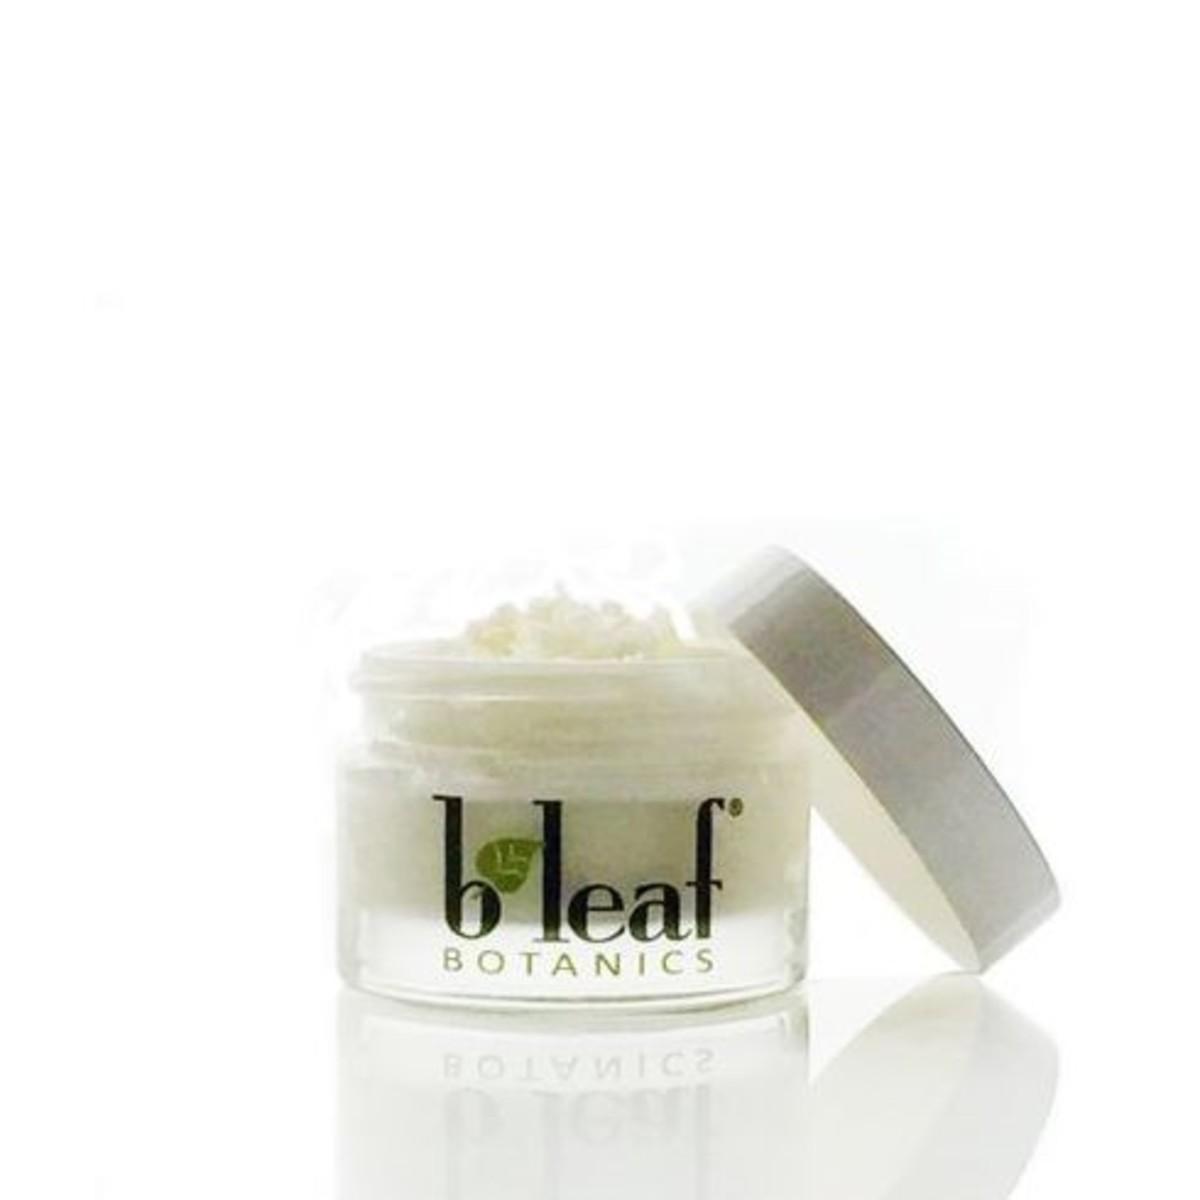 B Leaf Botanics Lip Scrub